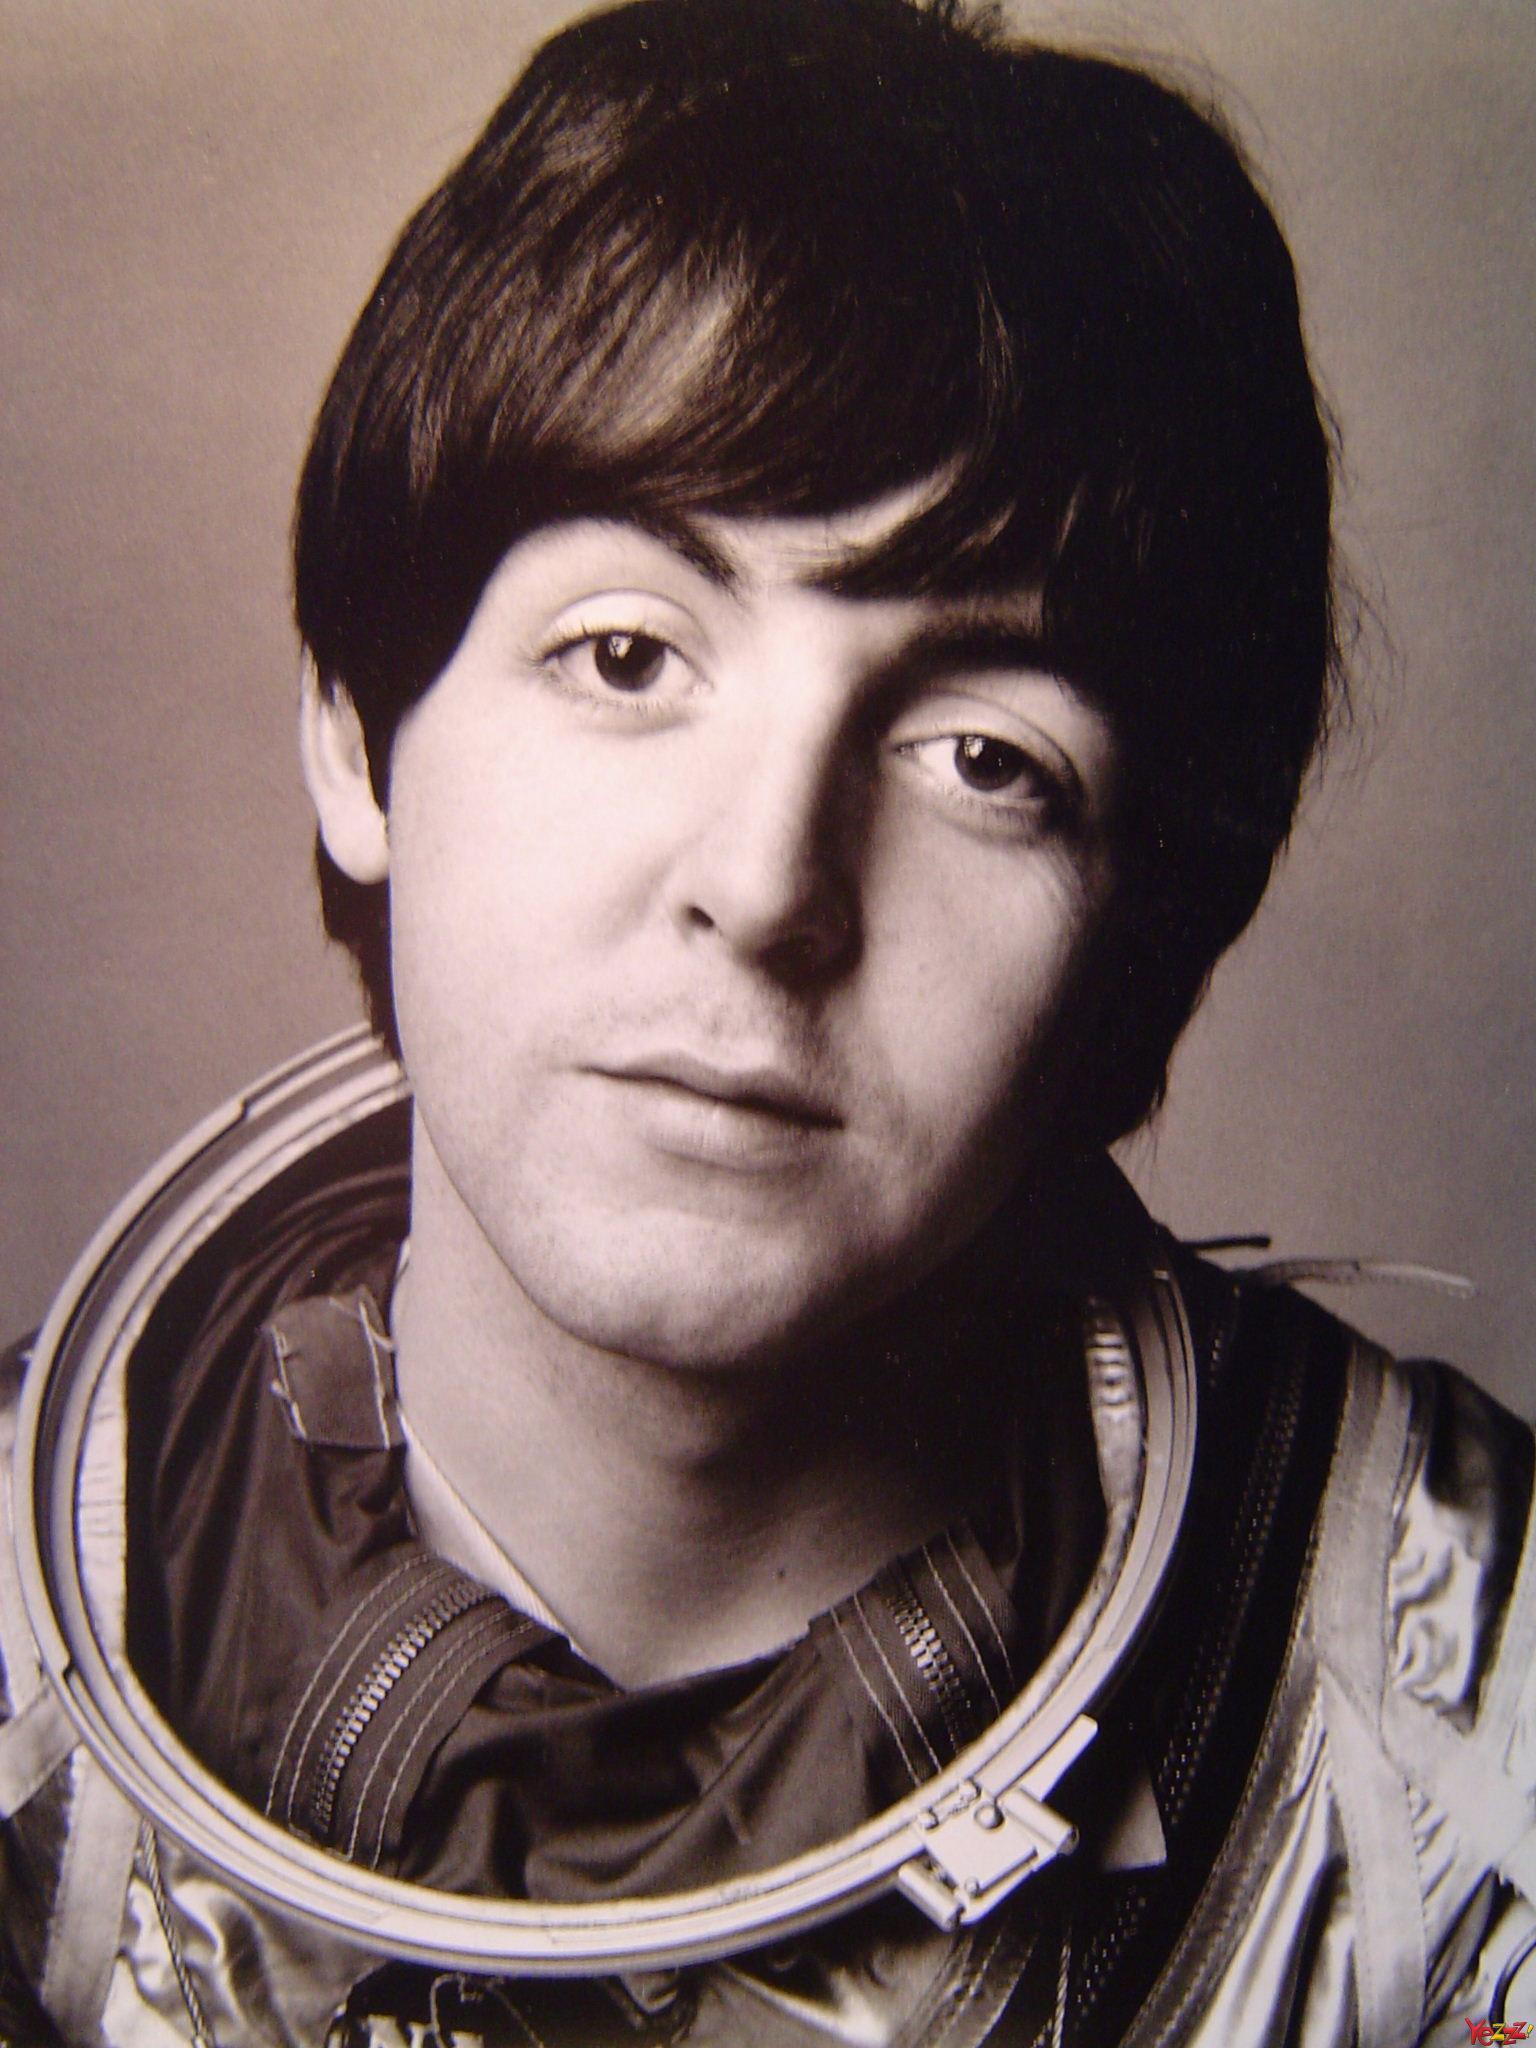 Paul McCartney Photo Gallery